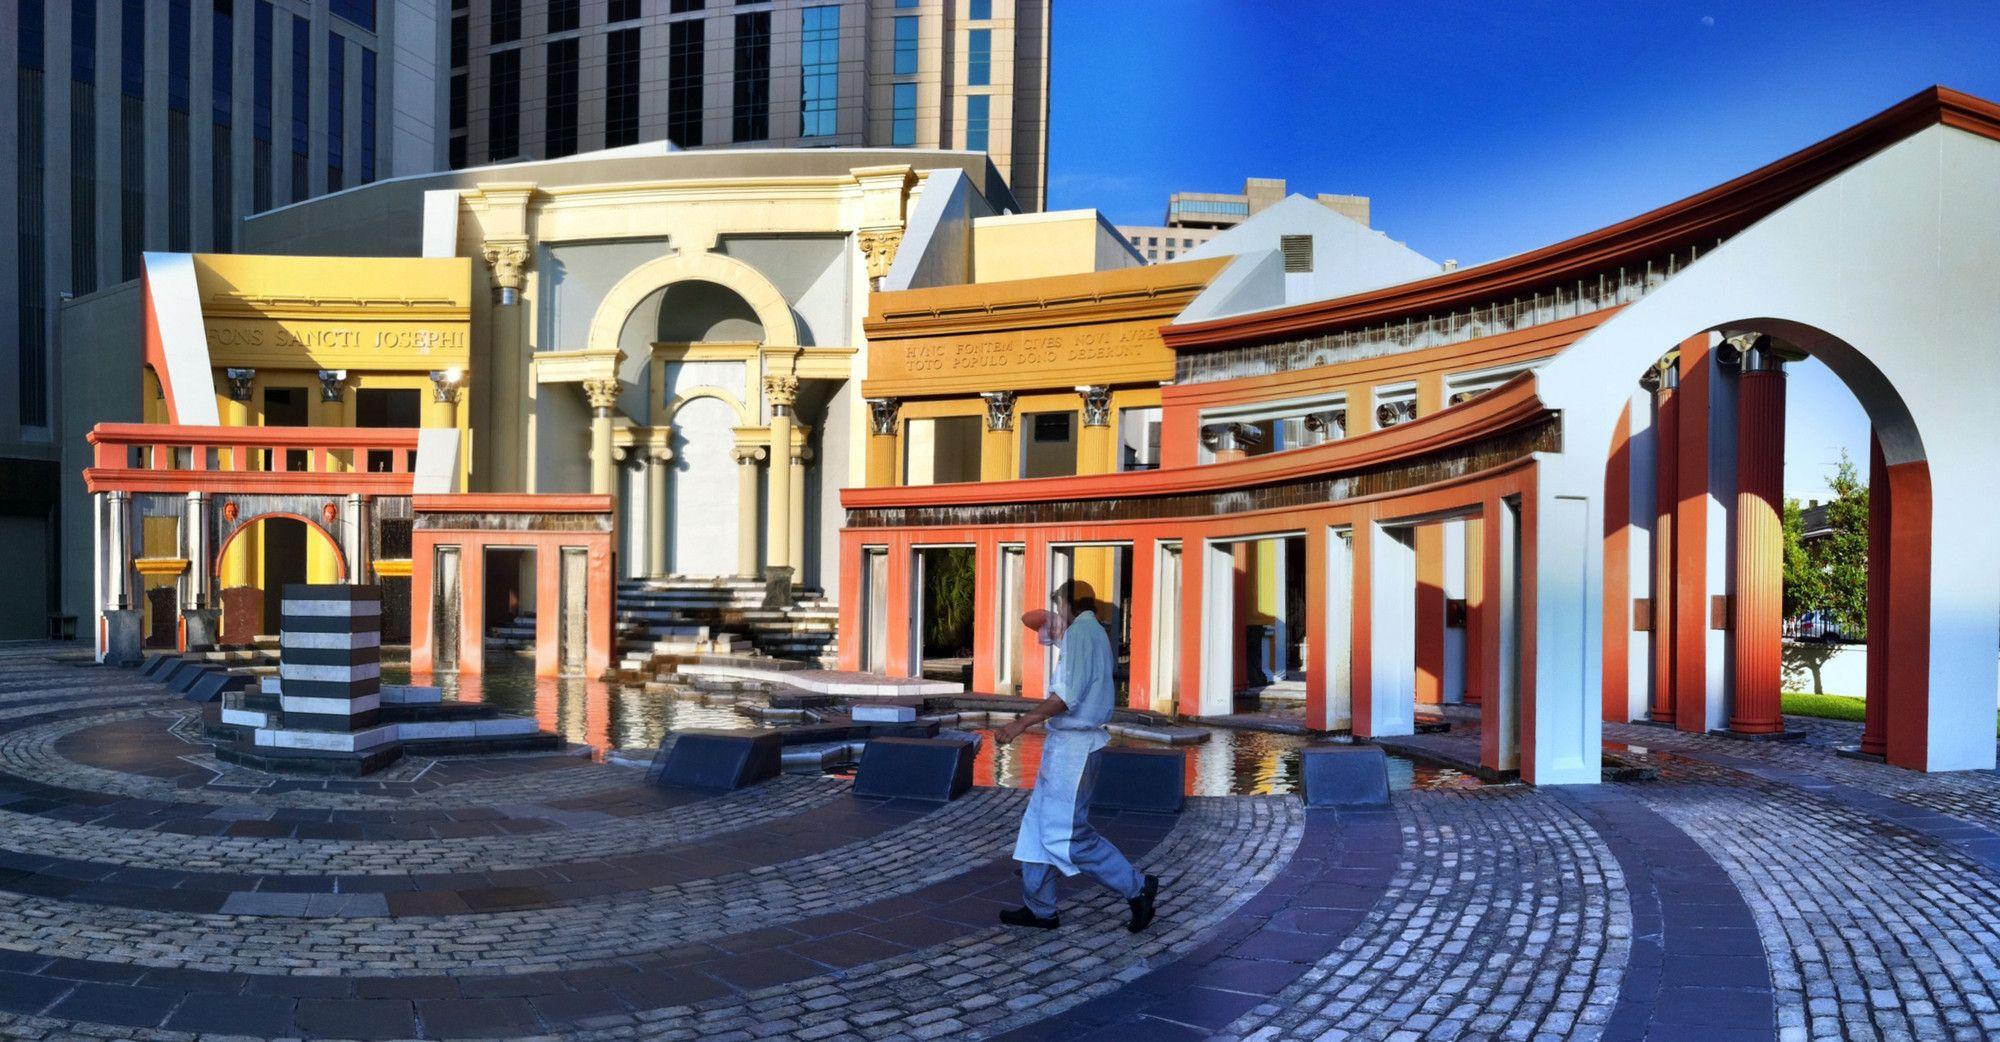 Modern Architecture New Orleans